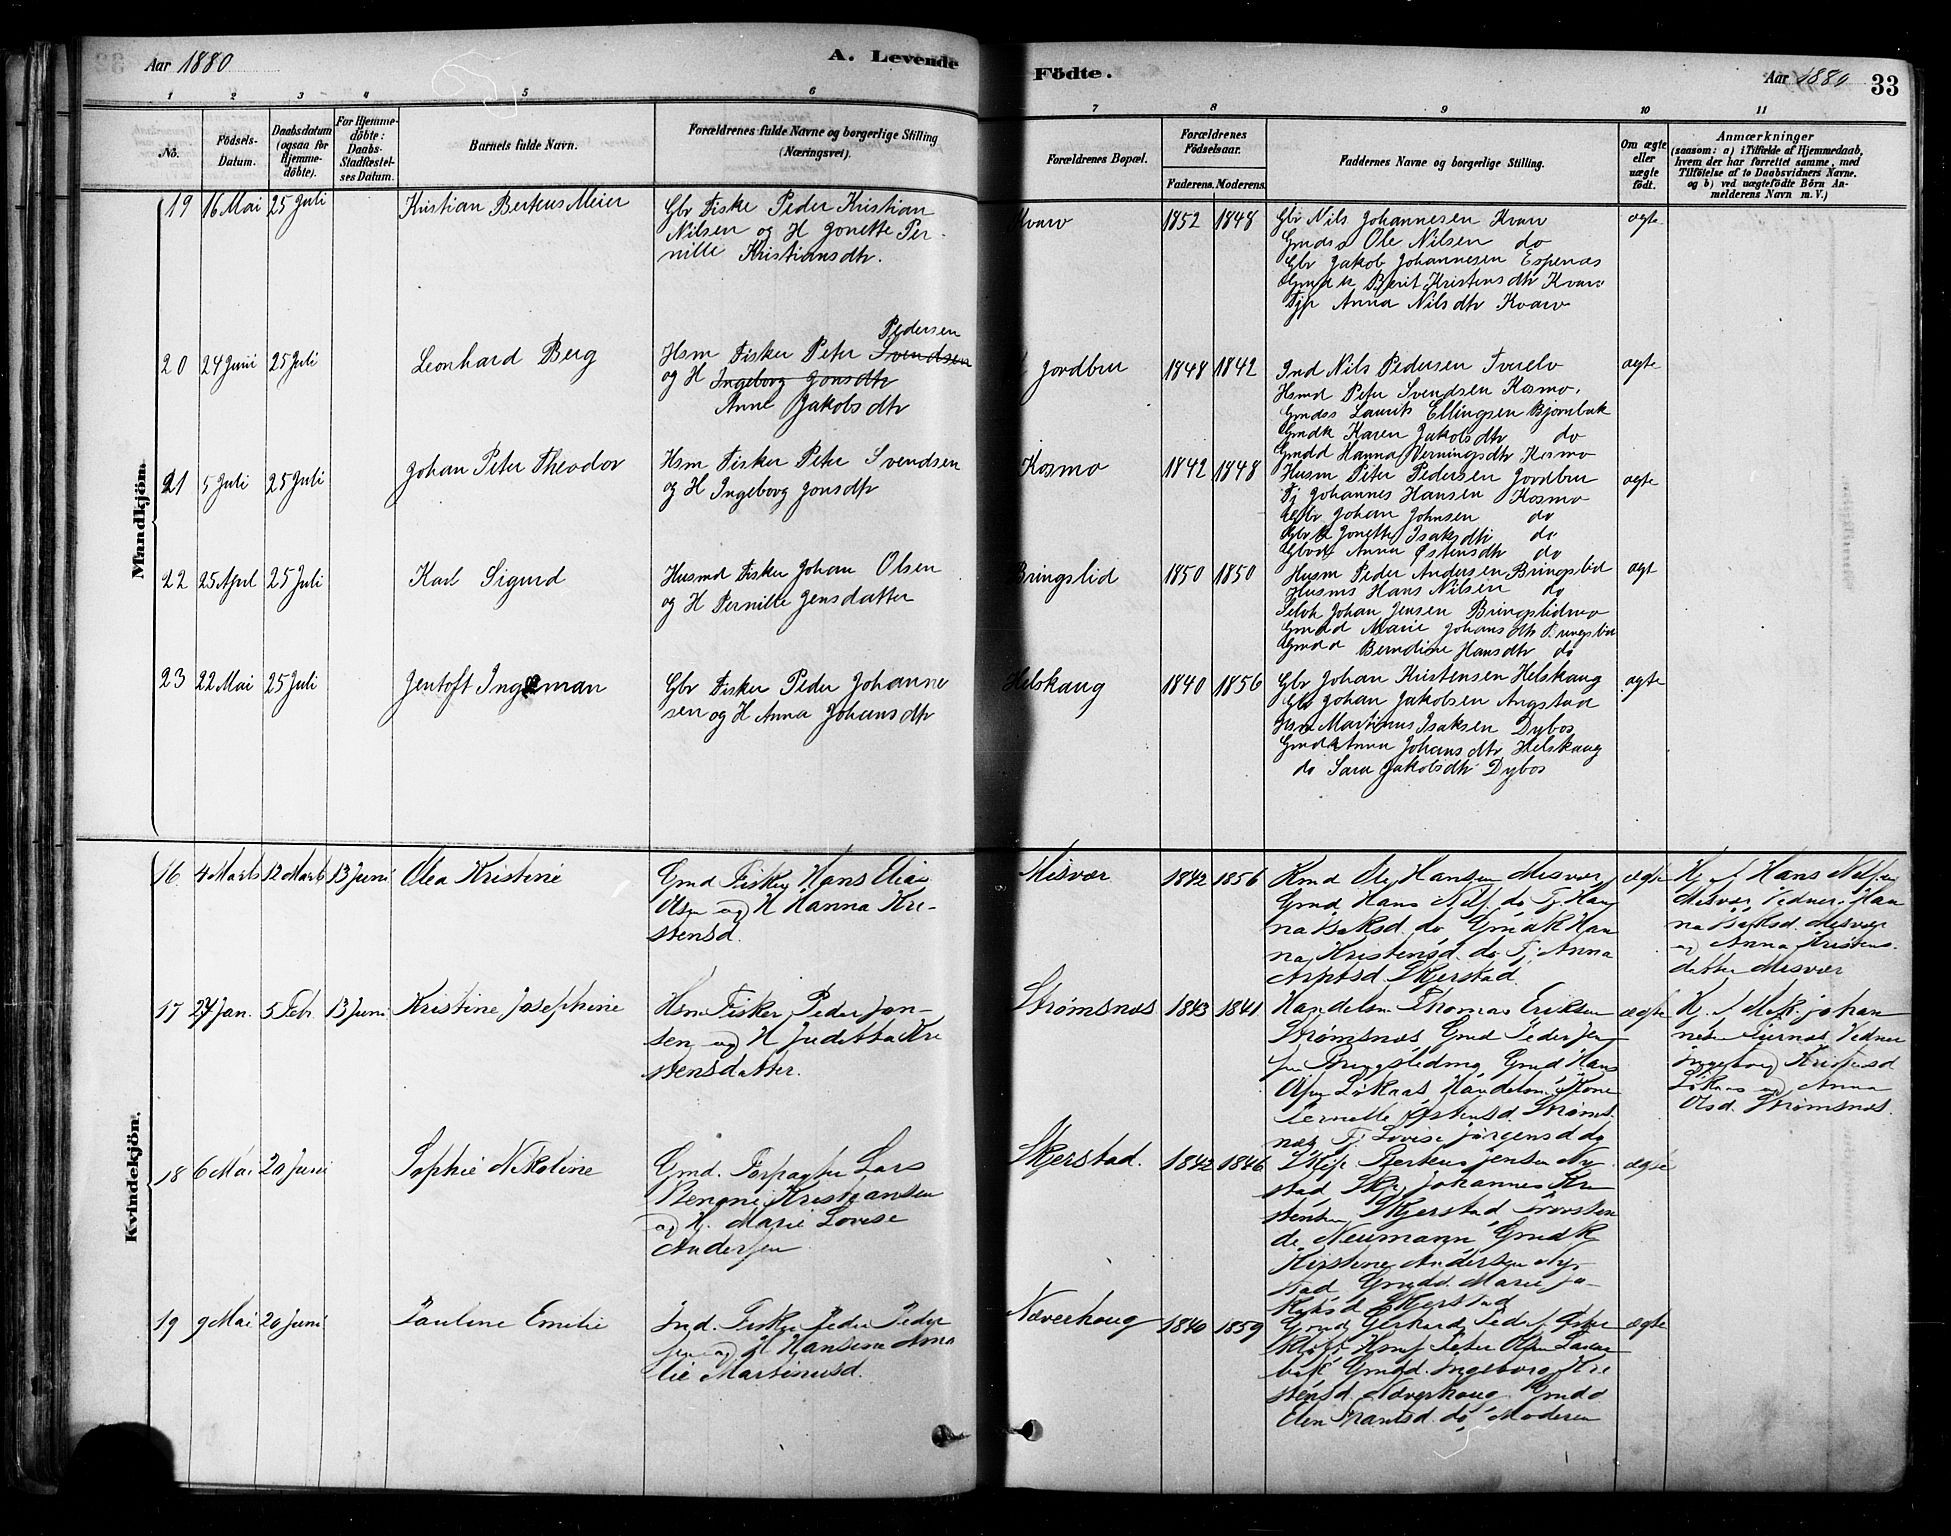 SAT, Ministerialprotokoller, klokkerbøker og fødselsregistre - Nordland, 852/L0740: Ministerialbok nr. 852A10, 1878-1894, s. 33